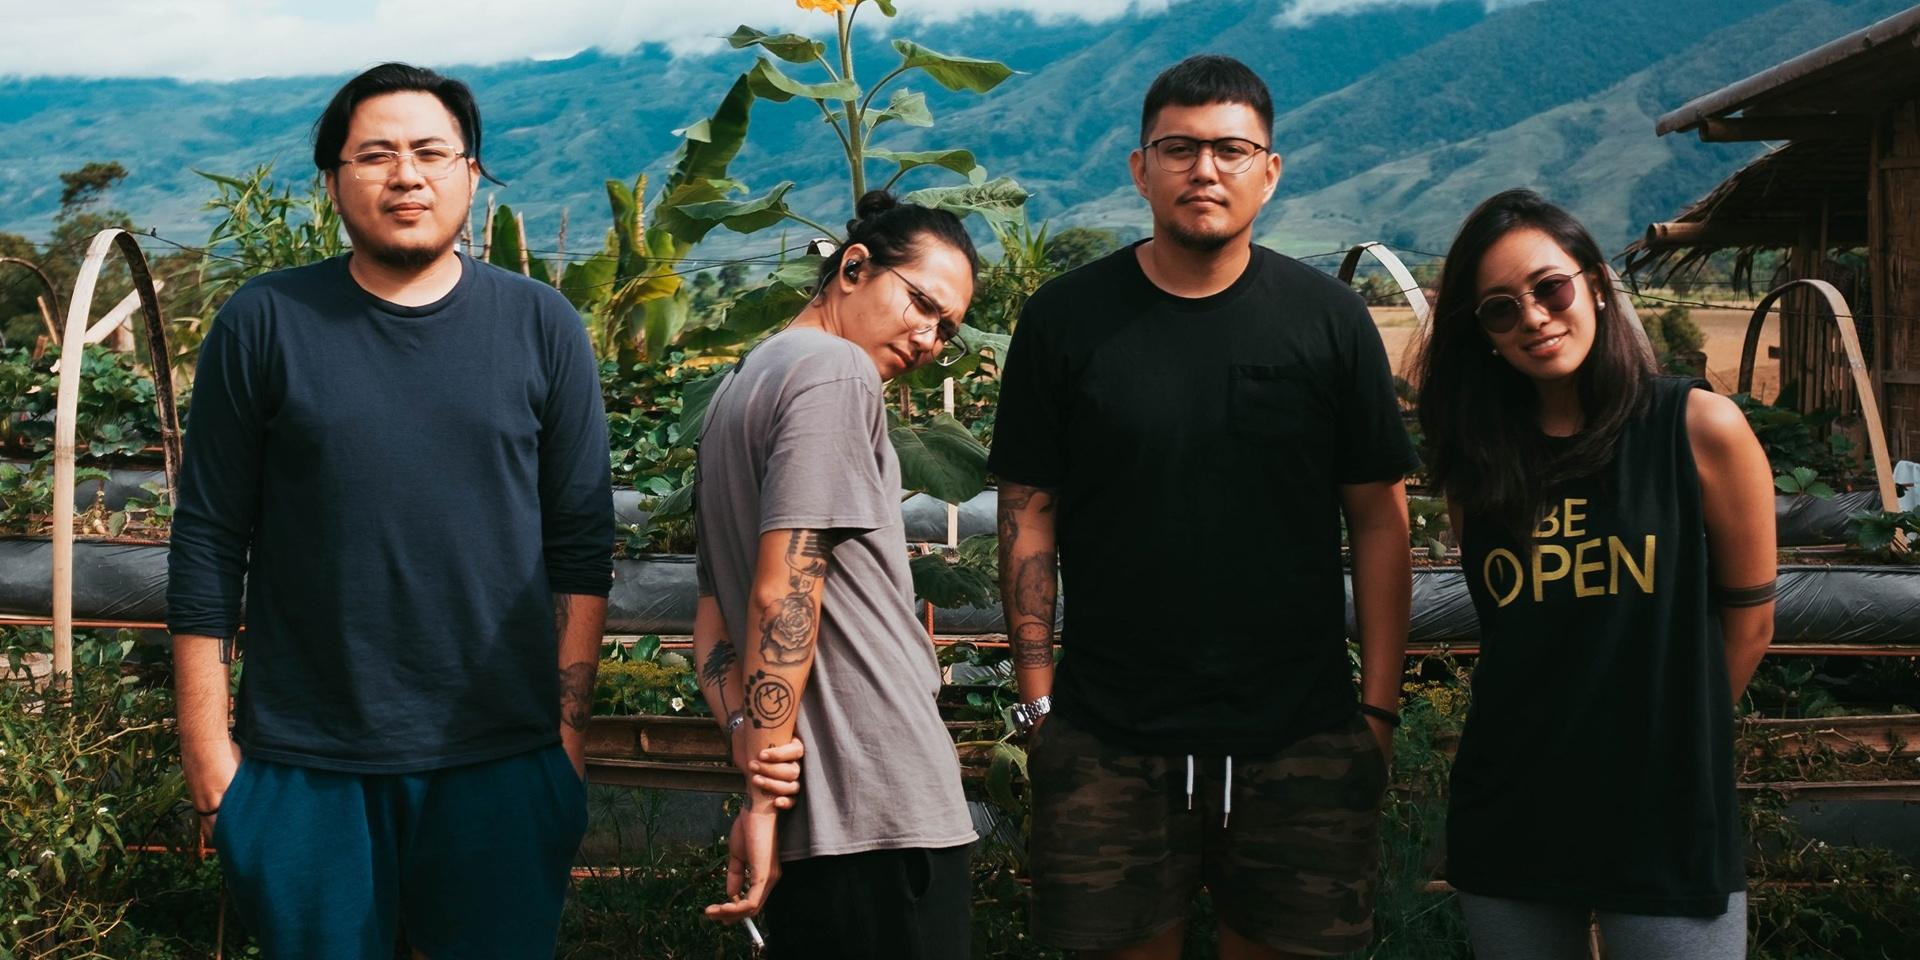 Loop disband, say their good bye with last single 'Slow' – listen